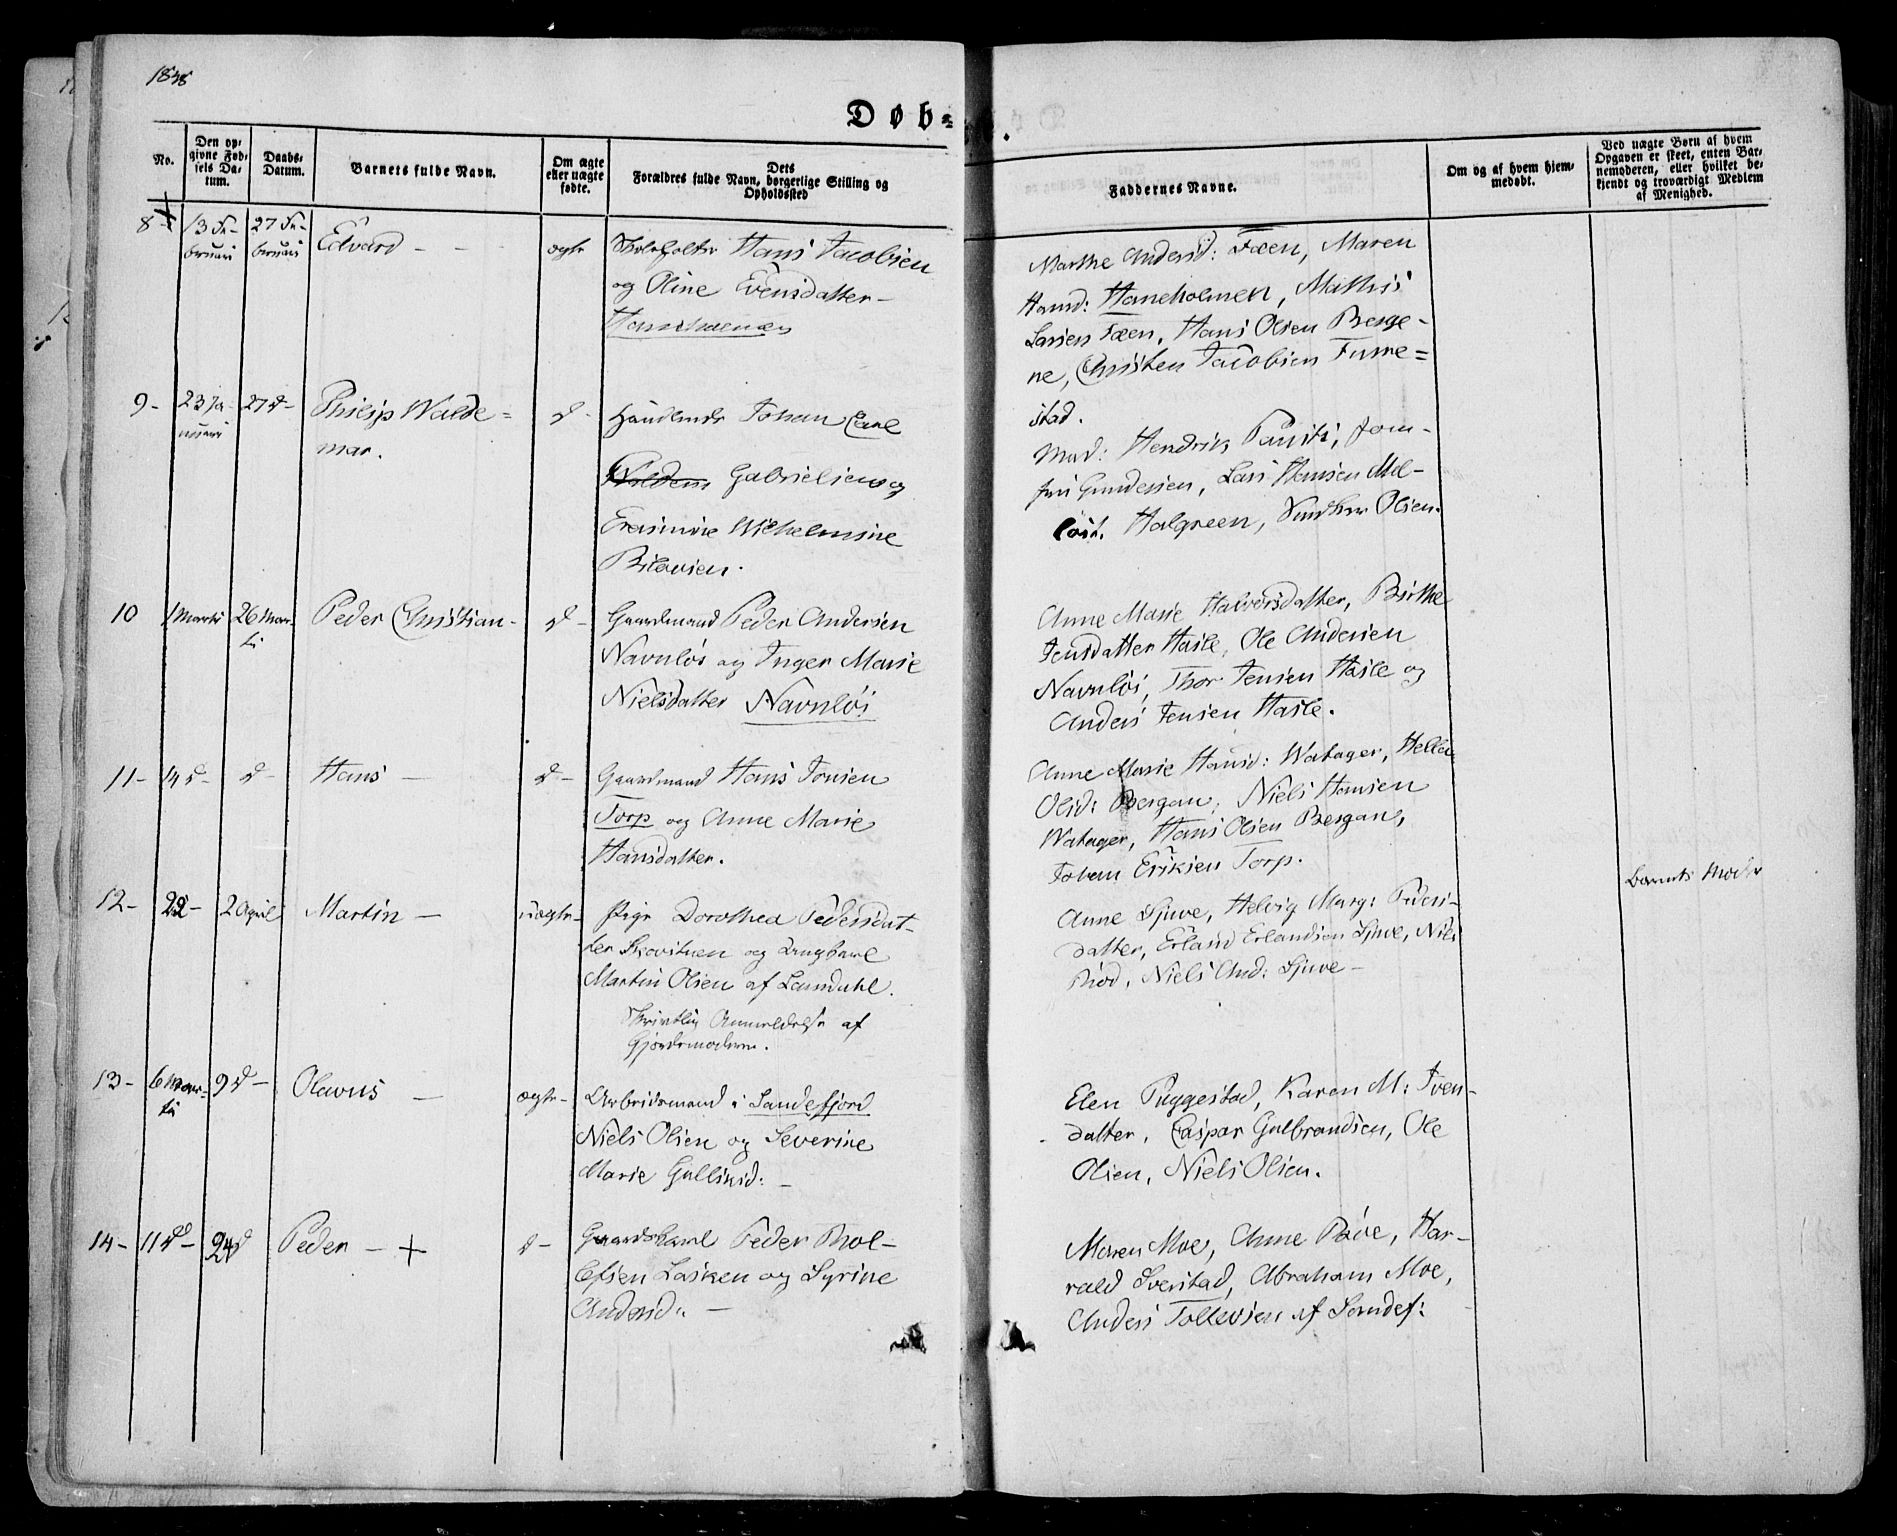 SAKO, Sandar kirkebøker, F/Fa/L0006: Ministerialbok nr. 6, 1847-1860, s. 6b